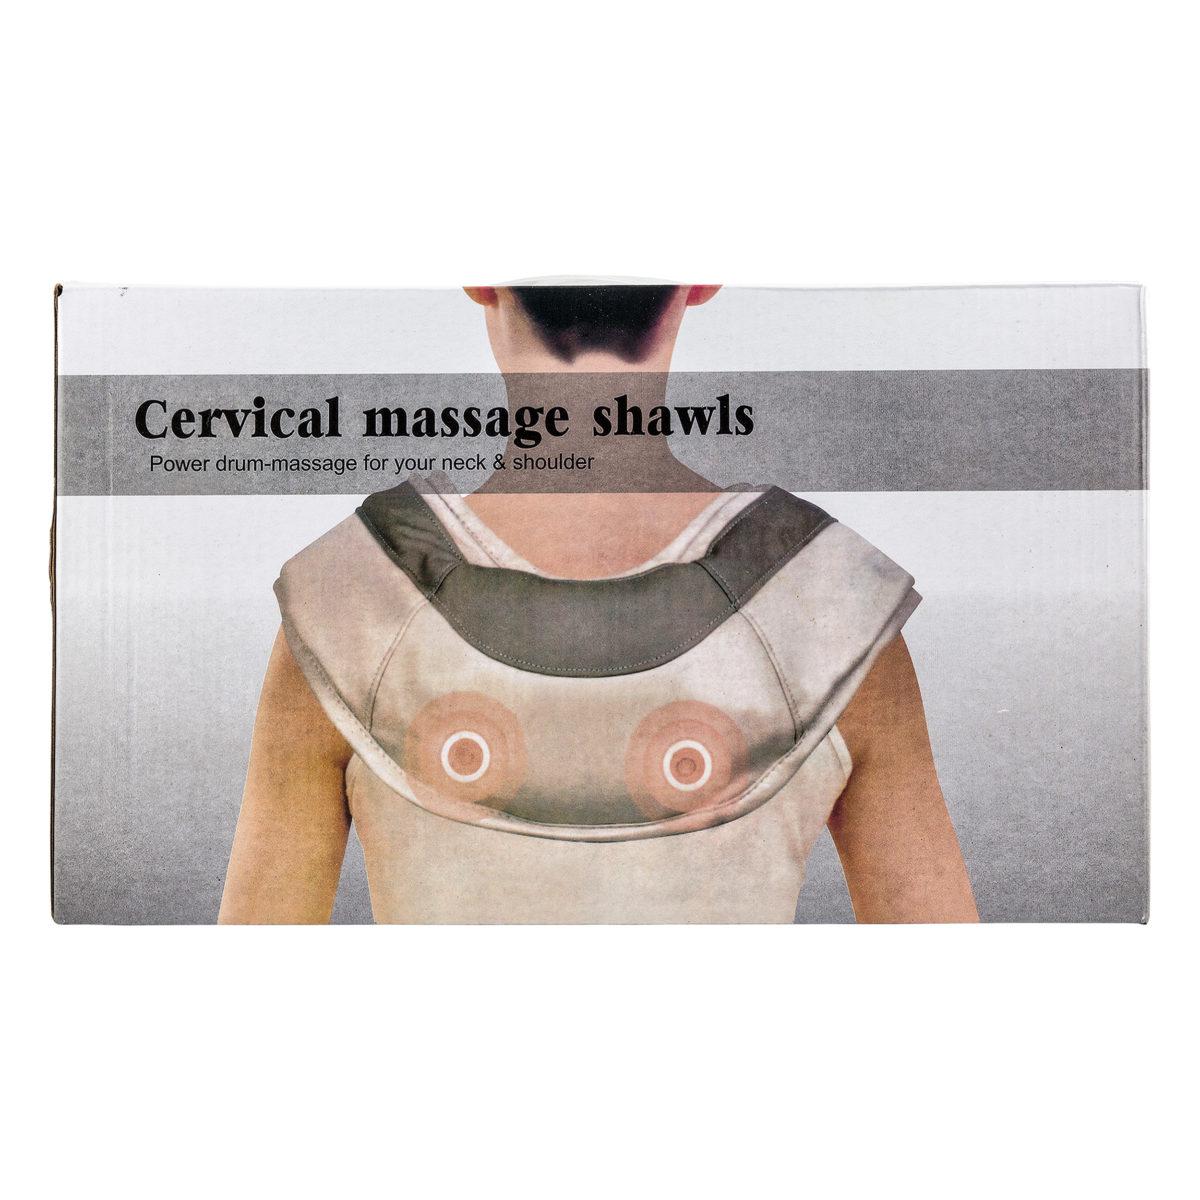 Массажер Cervical massage shawls оптом